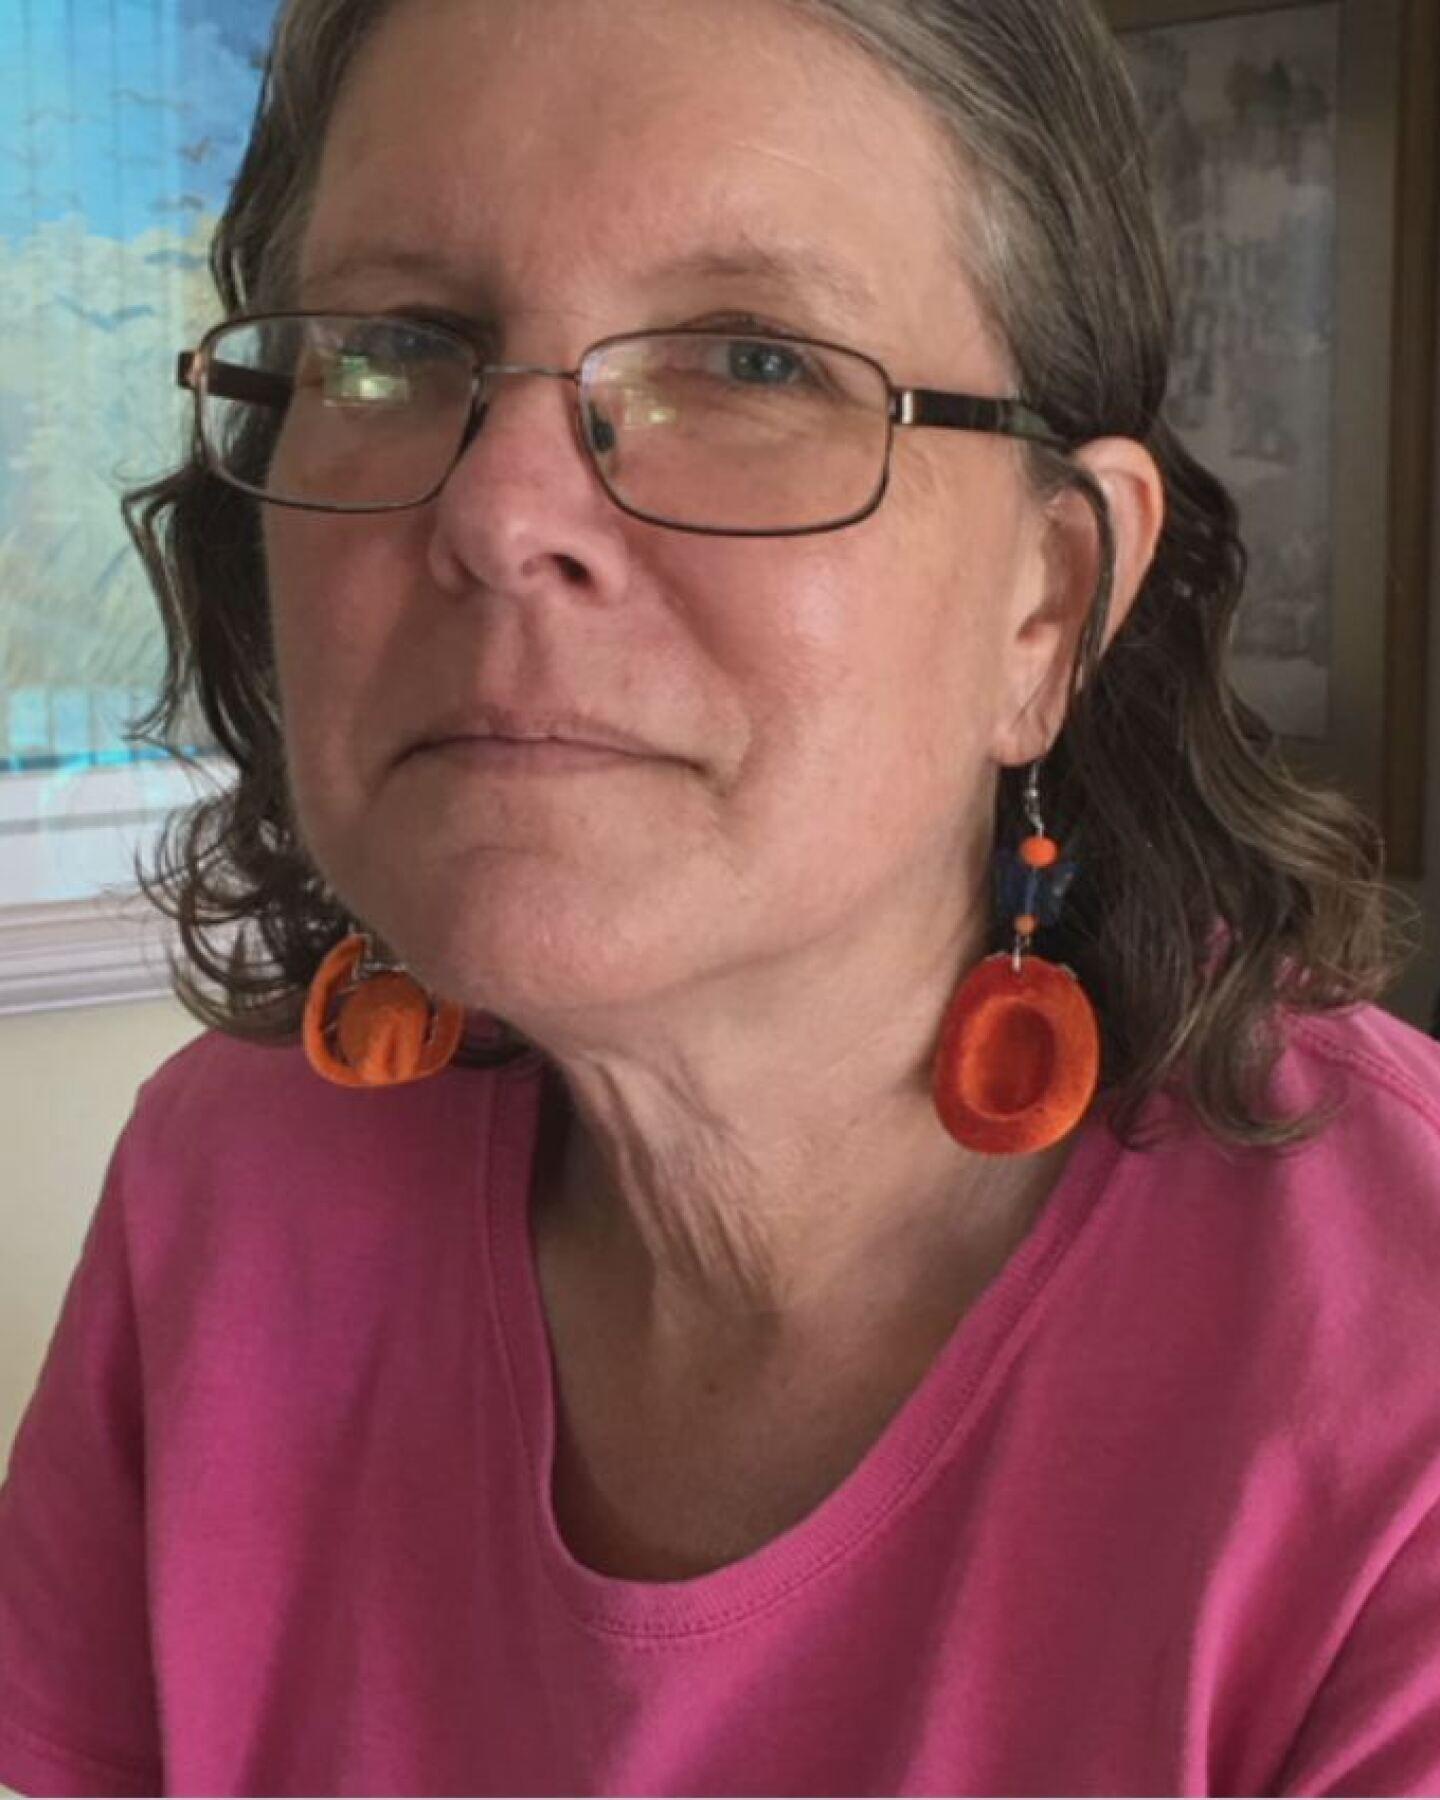 Alzheimer's sufferer Nancy Paulikas missing since October 2016